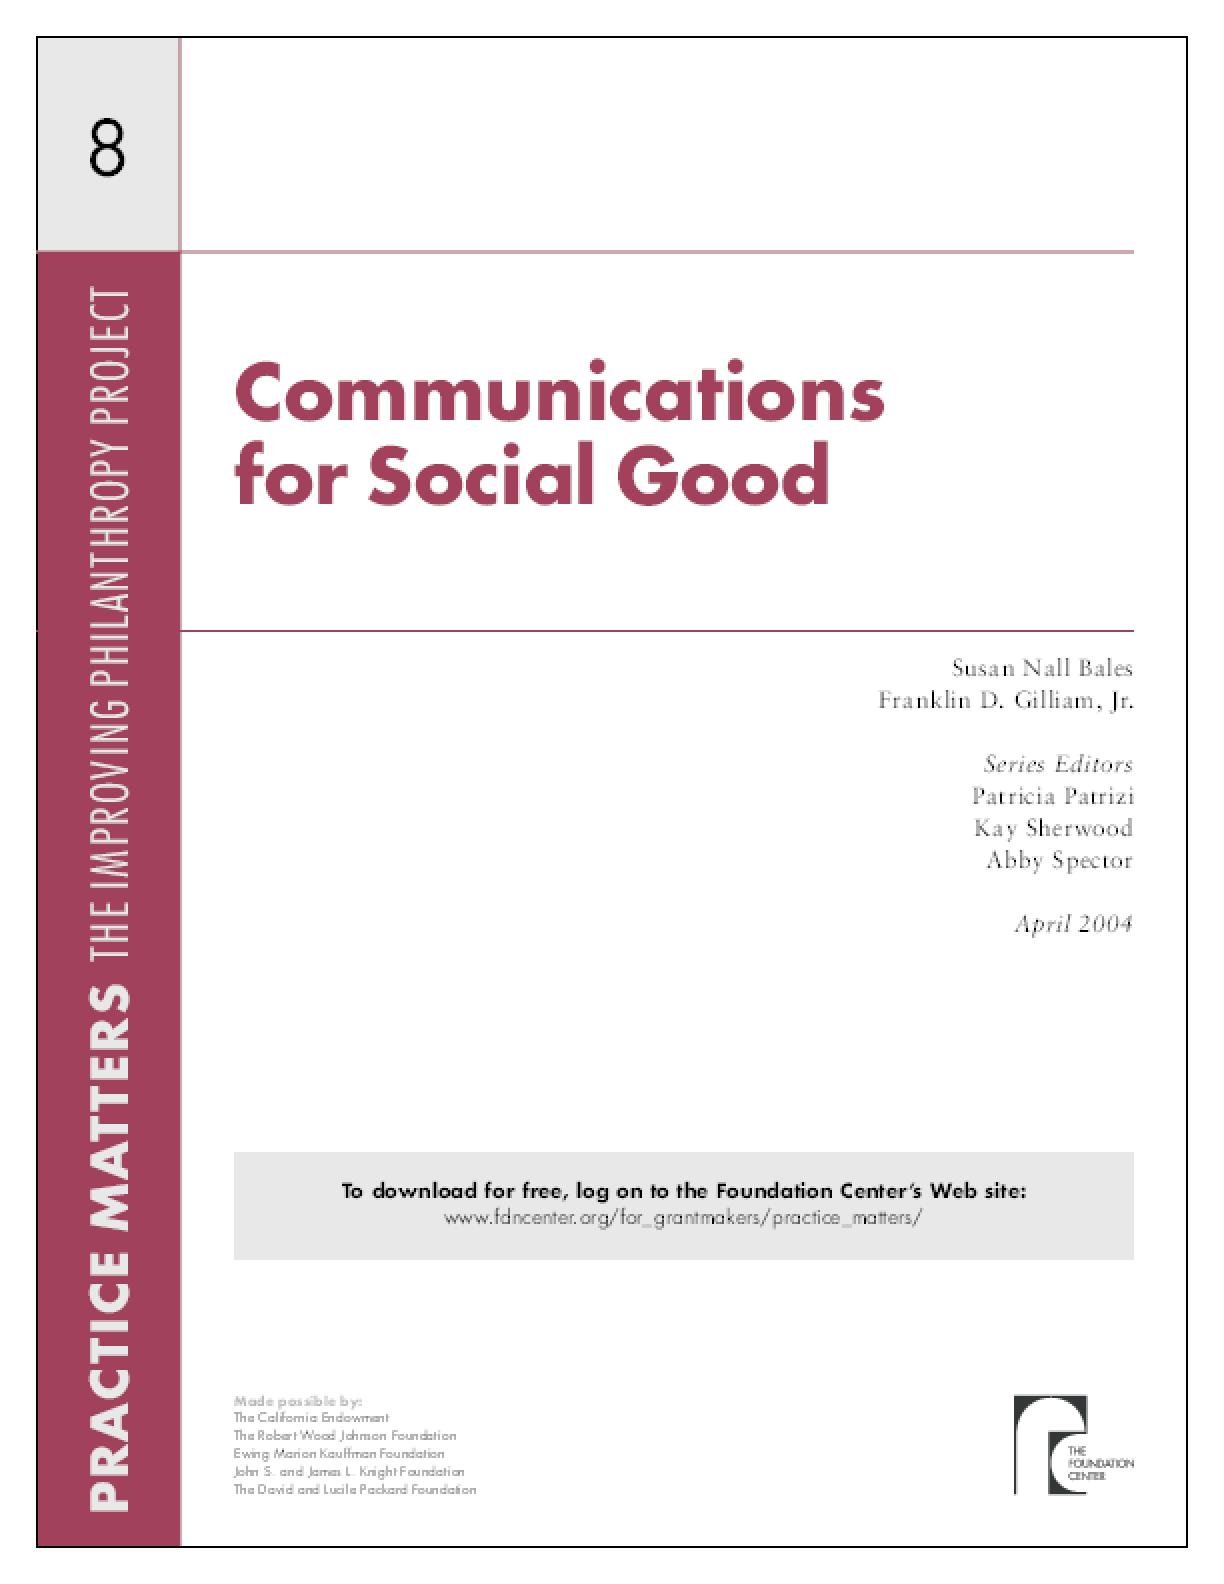 Communications for Social Good